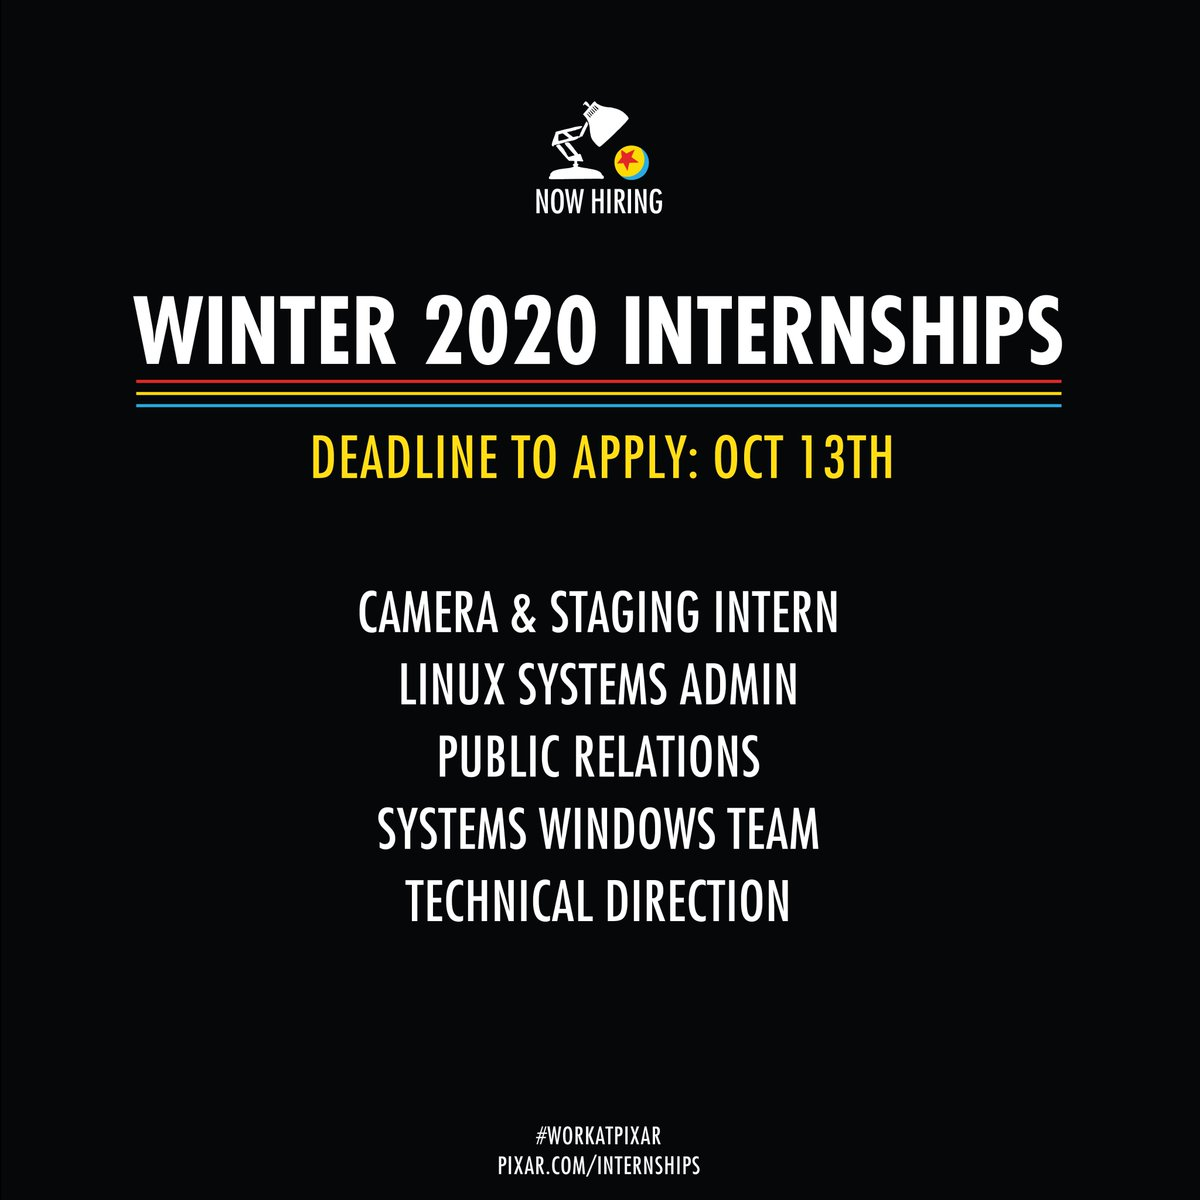 🚨 Now Hiring ❄️Winter 2020 Interns! 🚨Apply today: http://tinyurl.com/y69kytmz🗓️Deadline to apply: October 13th#WorkAtPixar #PixarInterns